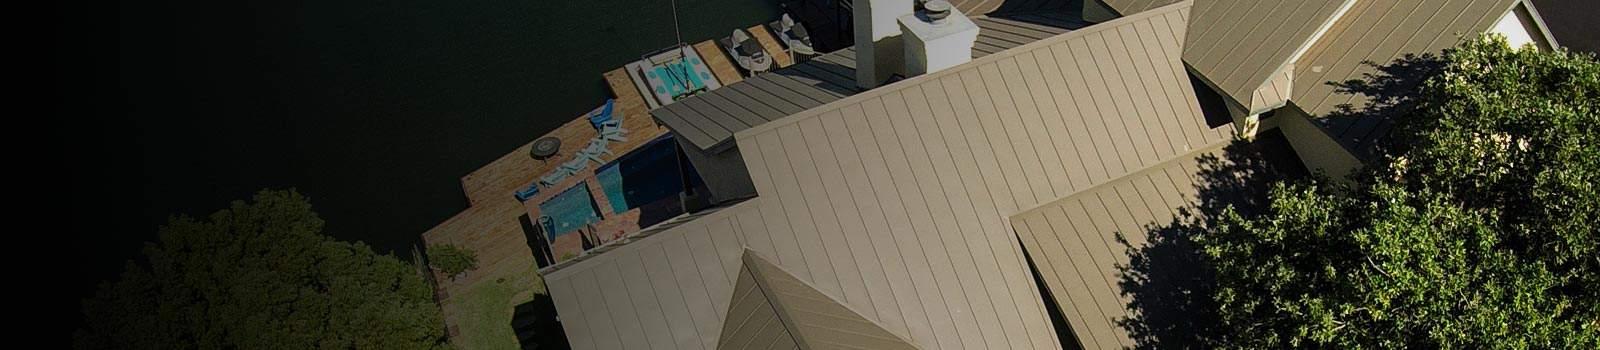 slide-bronze-standing-seam-roof2